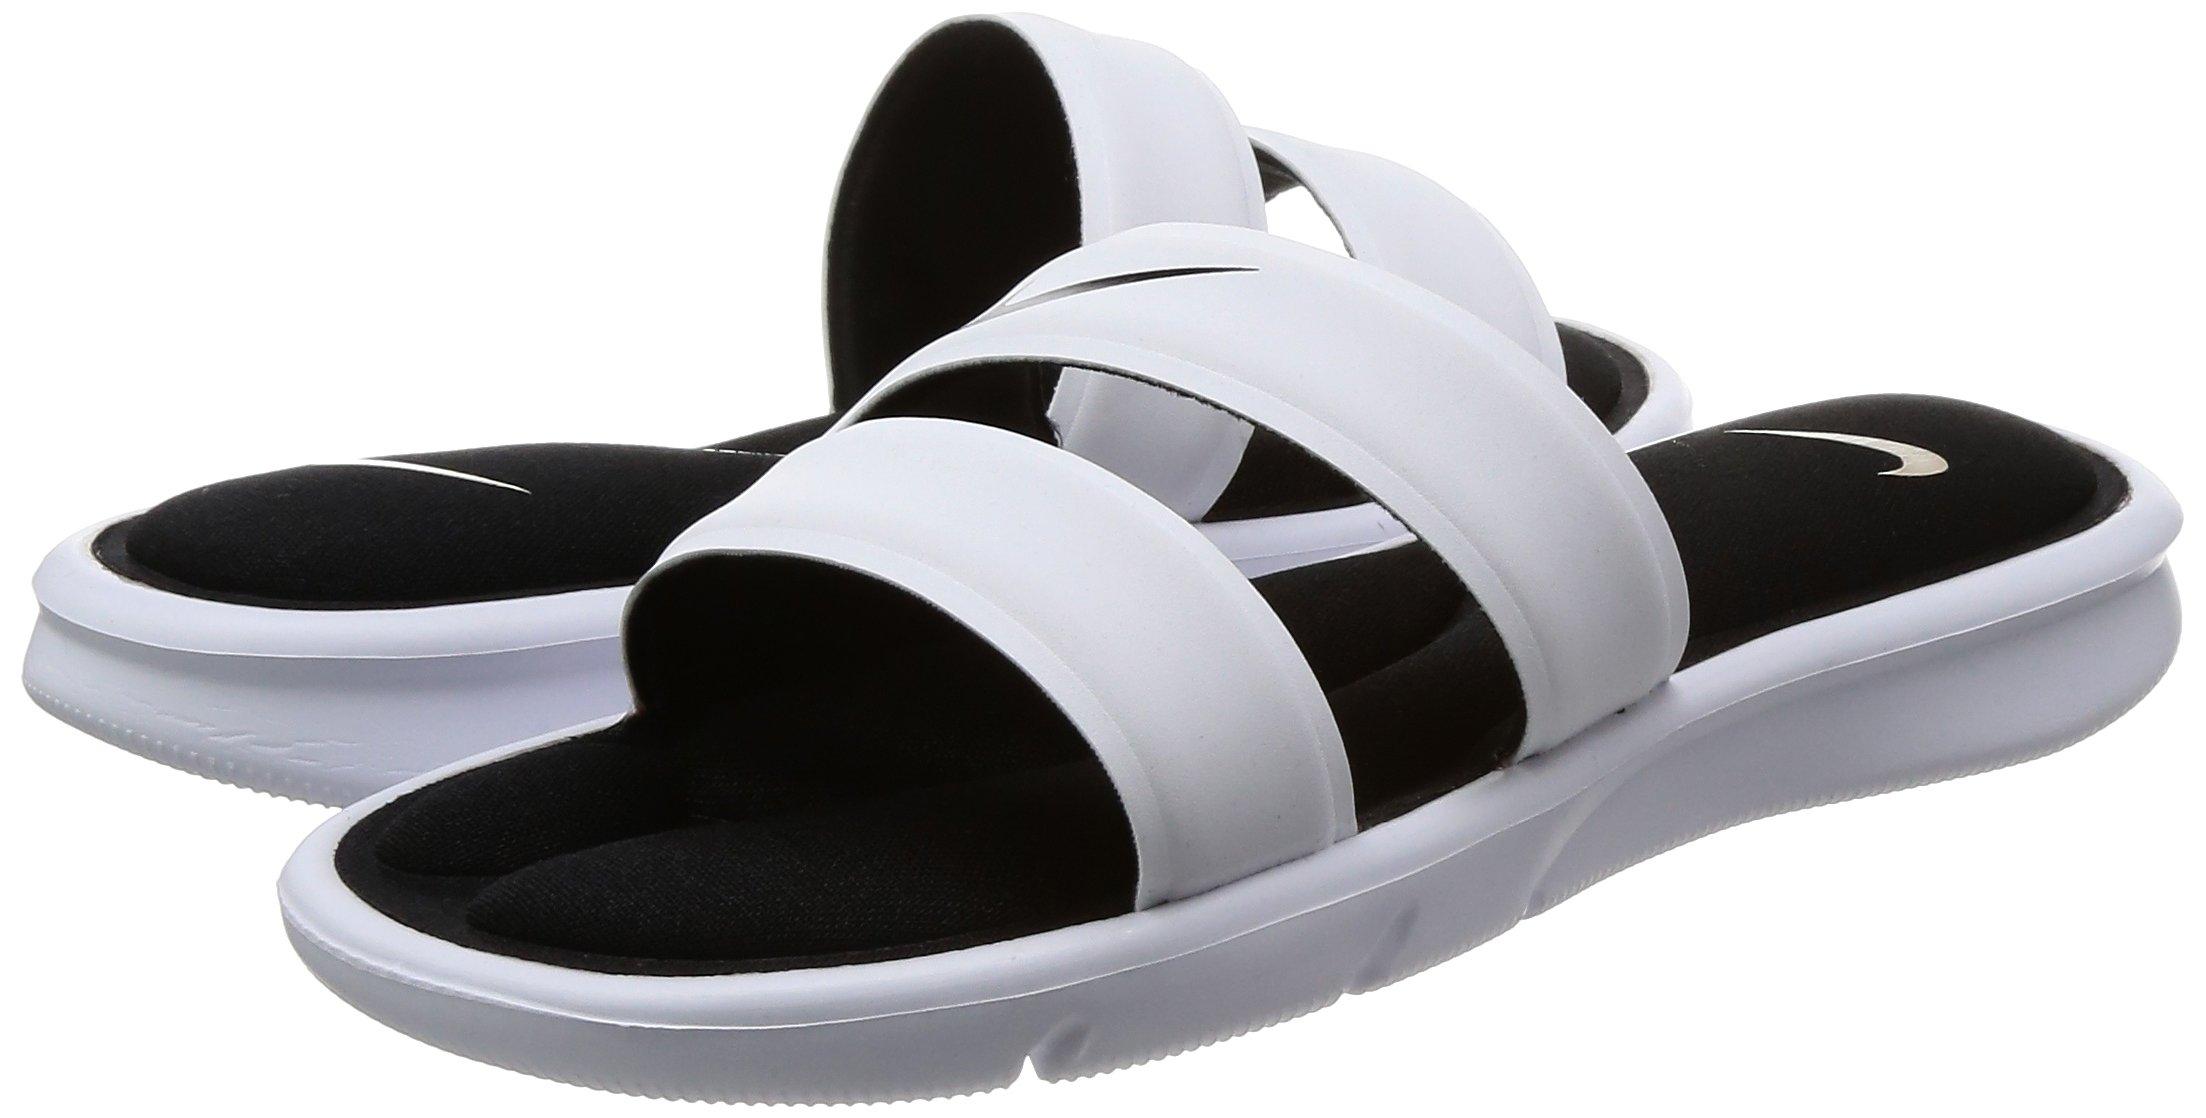 women's nike ultra comfort slide sandals